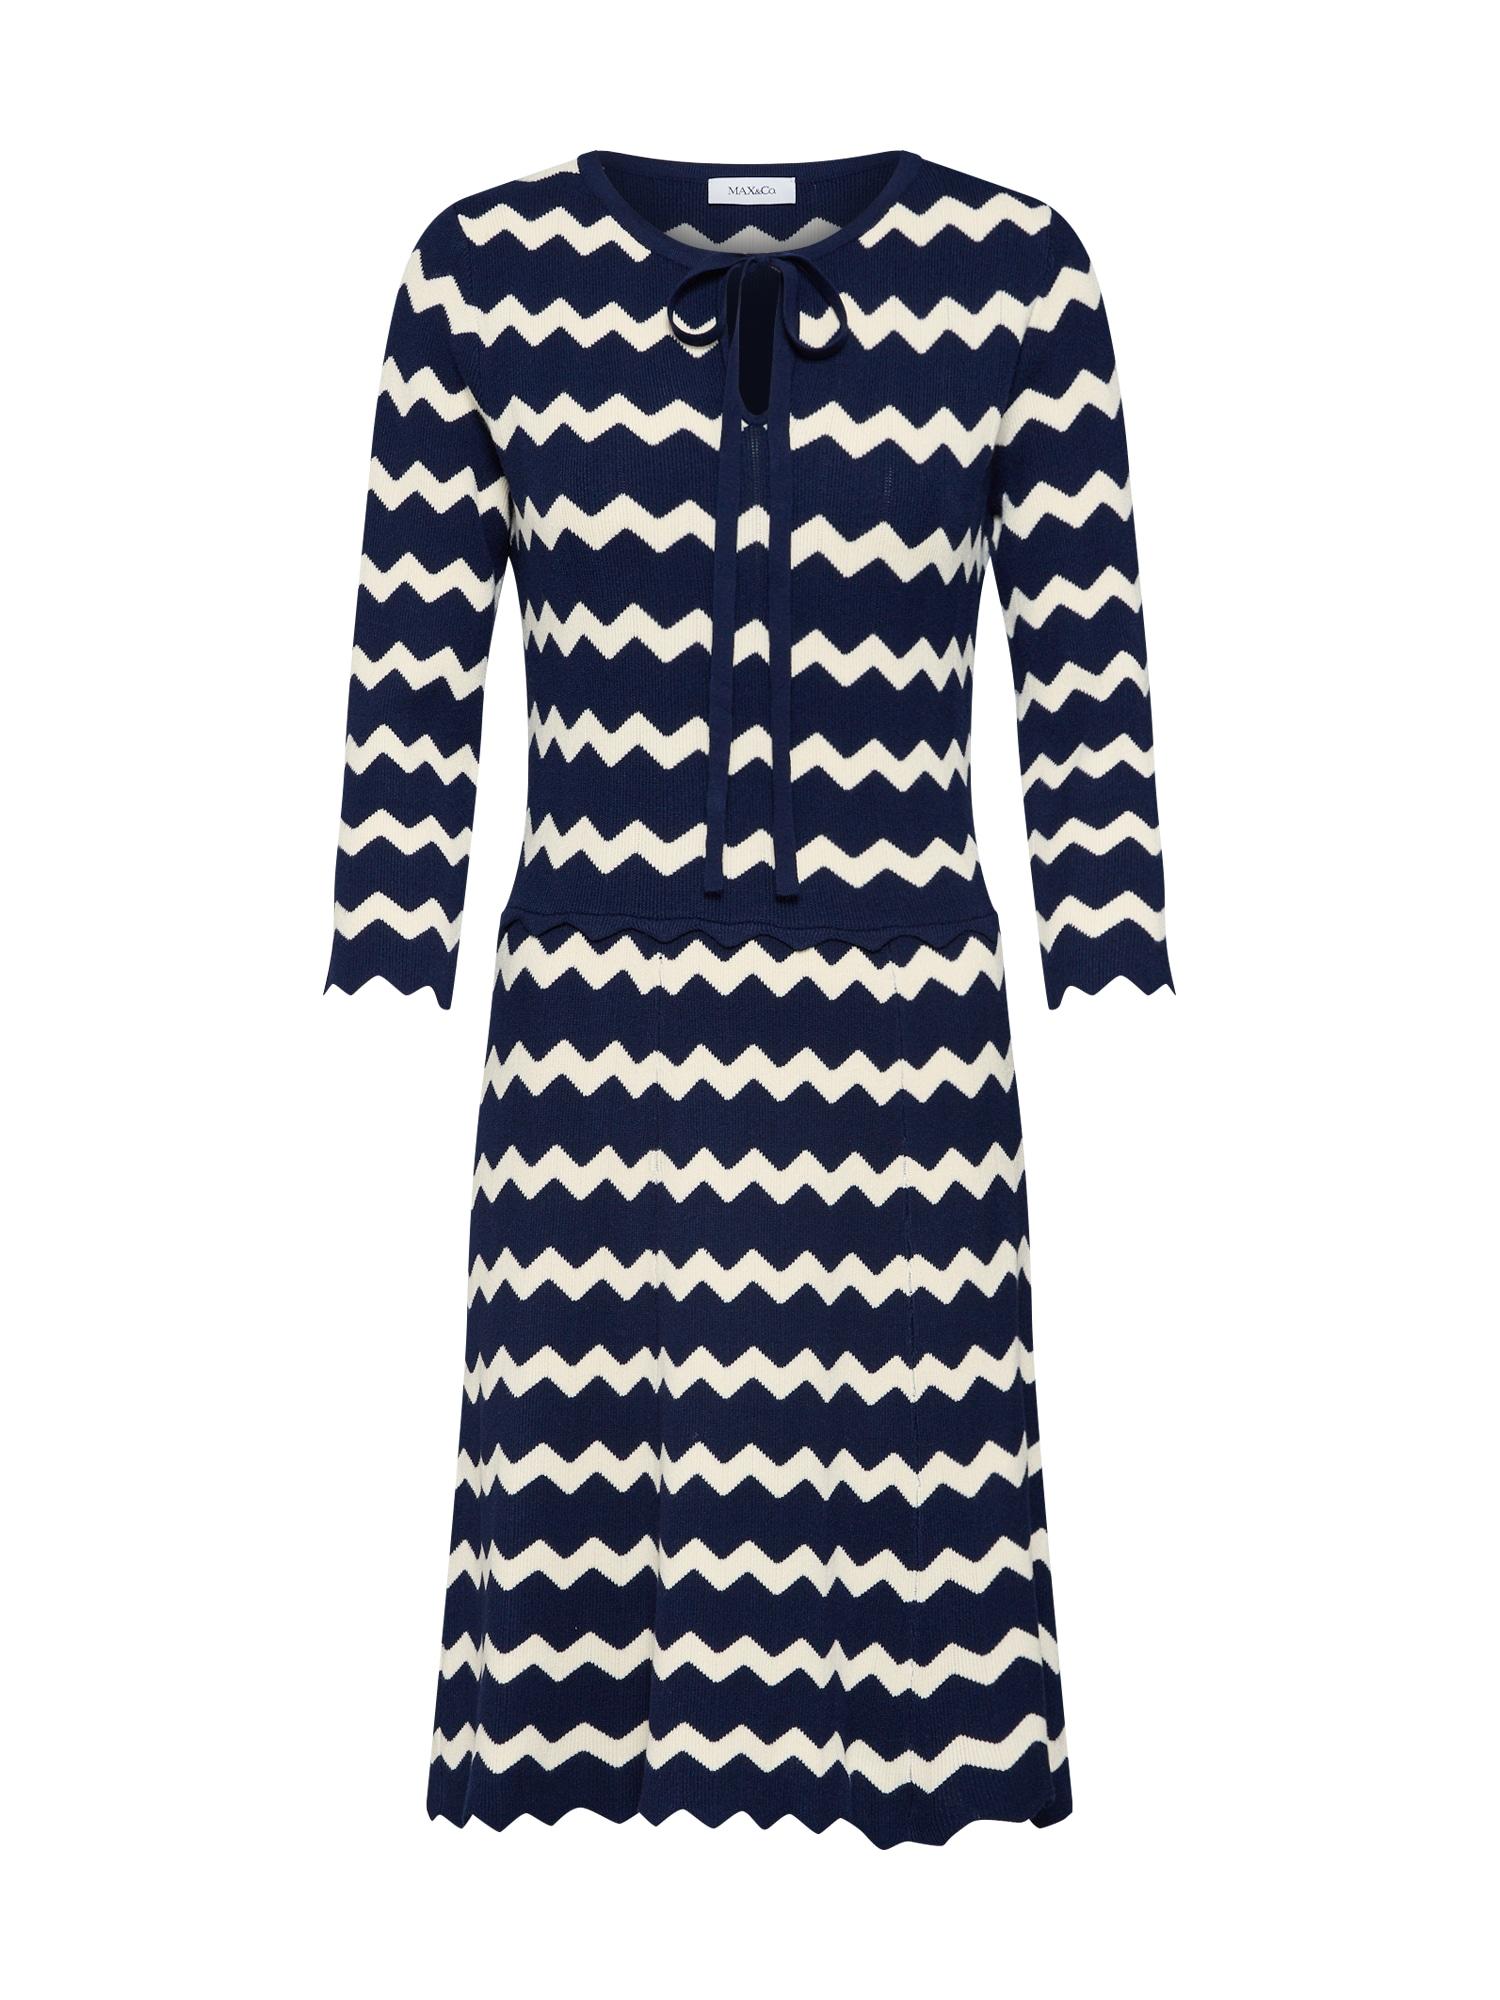 Šaty CRISTINA námořnická modř bílá MAX&Co.